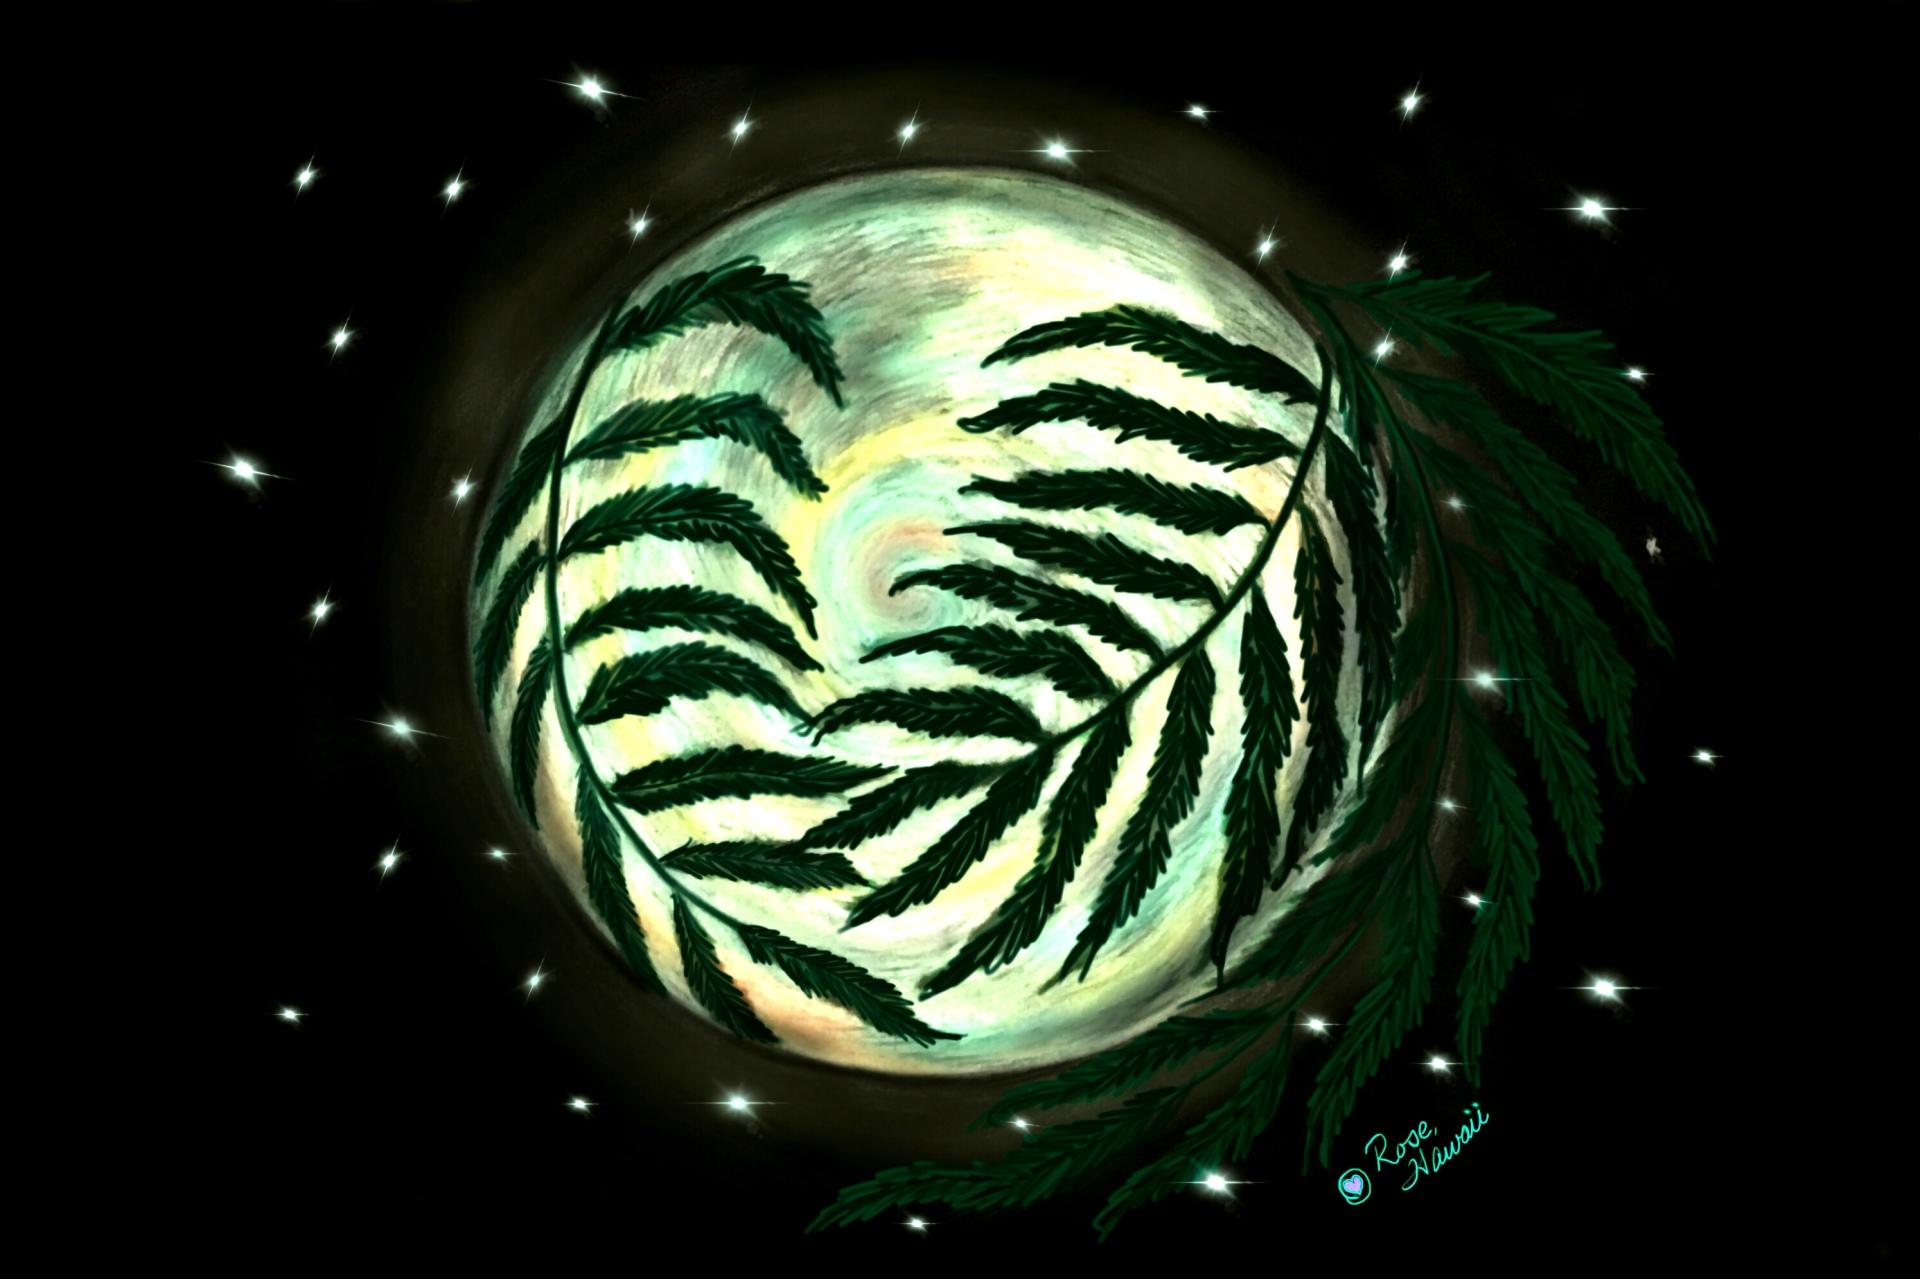 Full moon through ferns on black